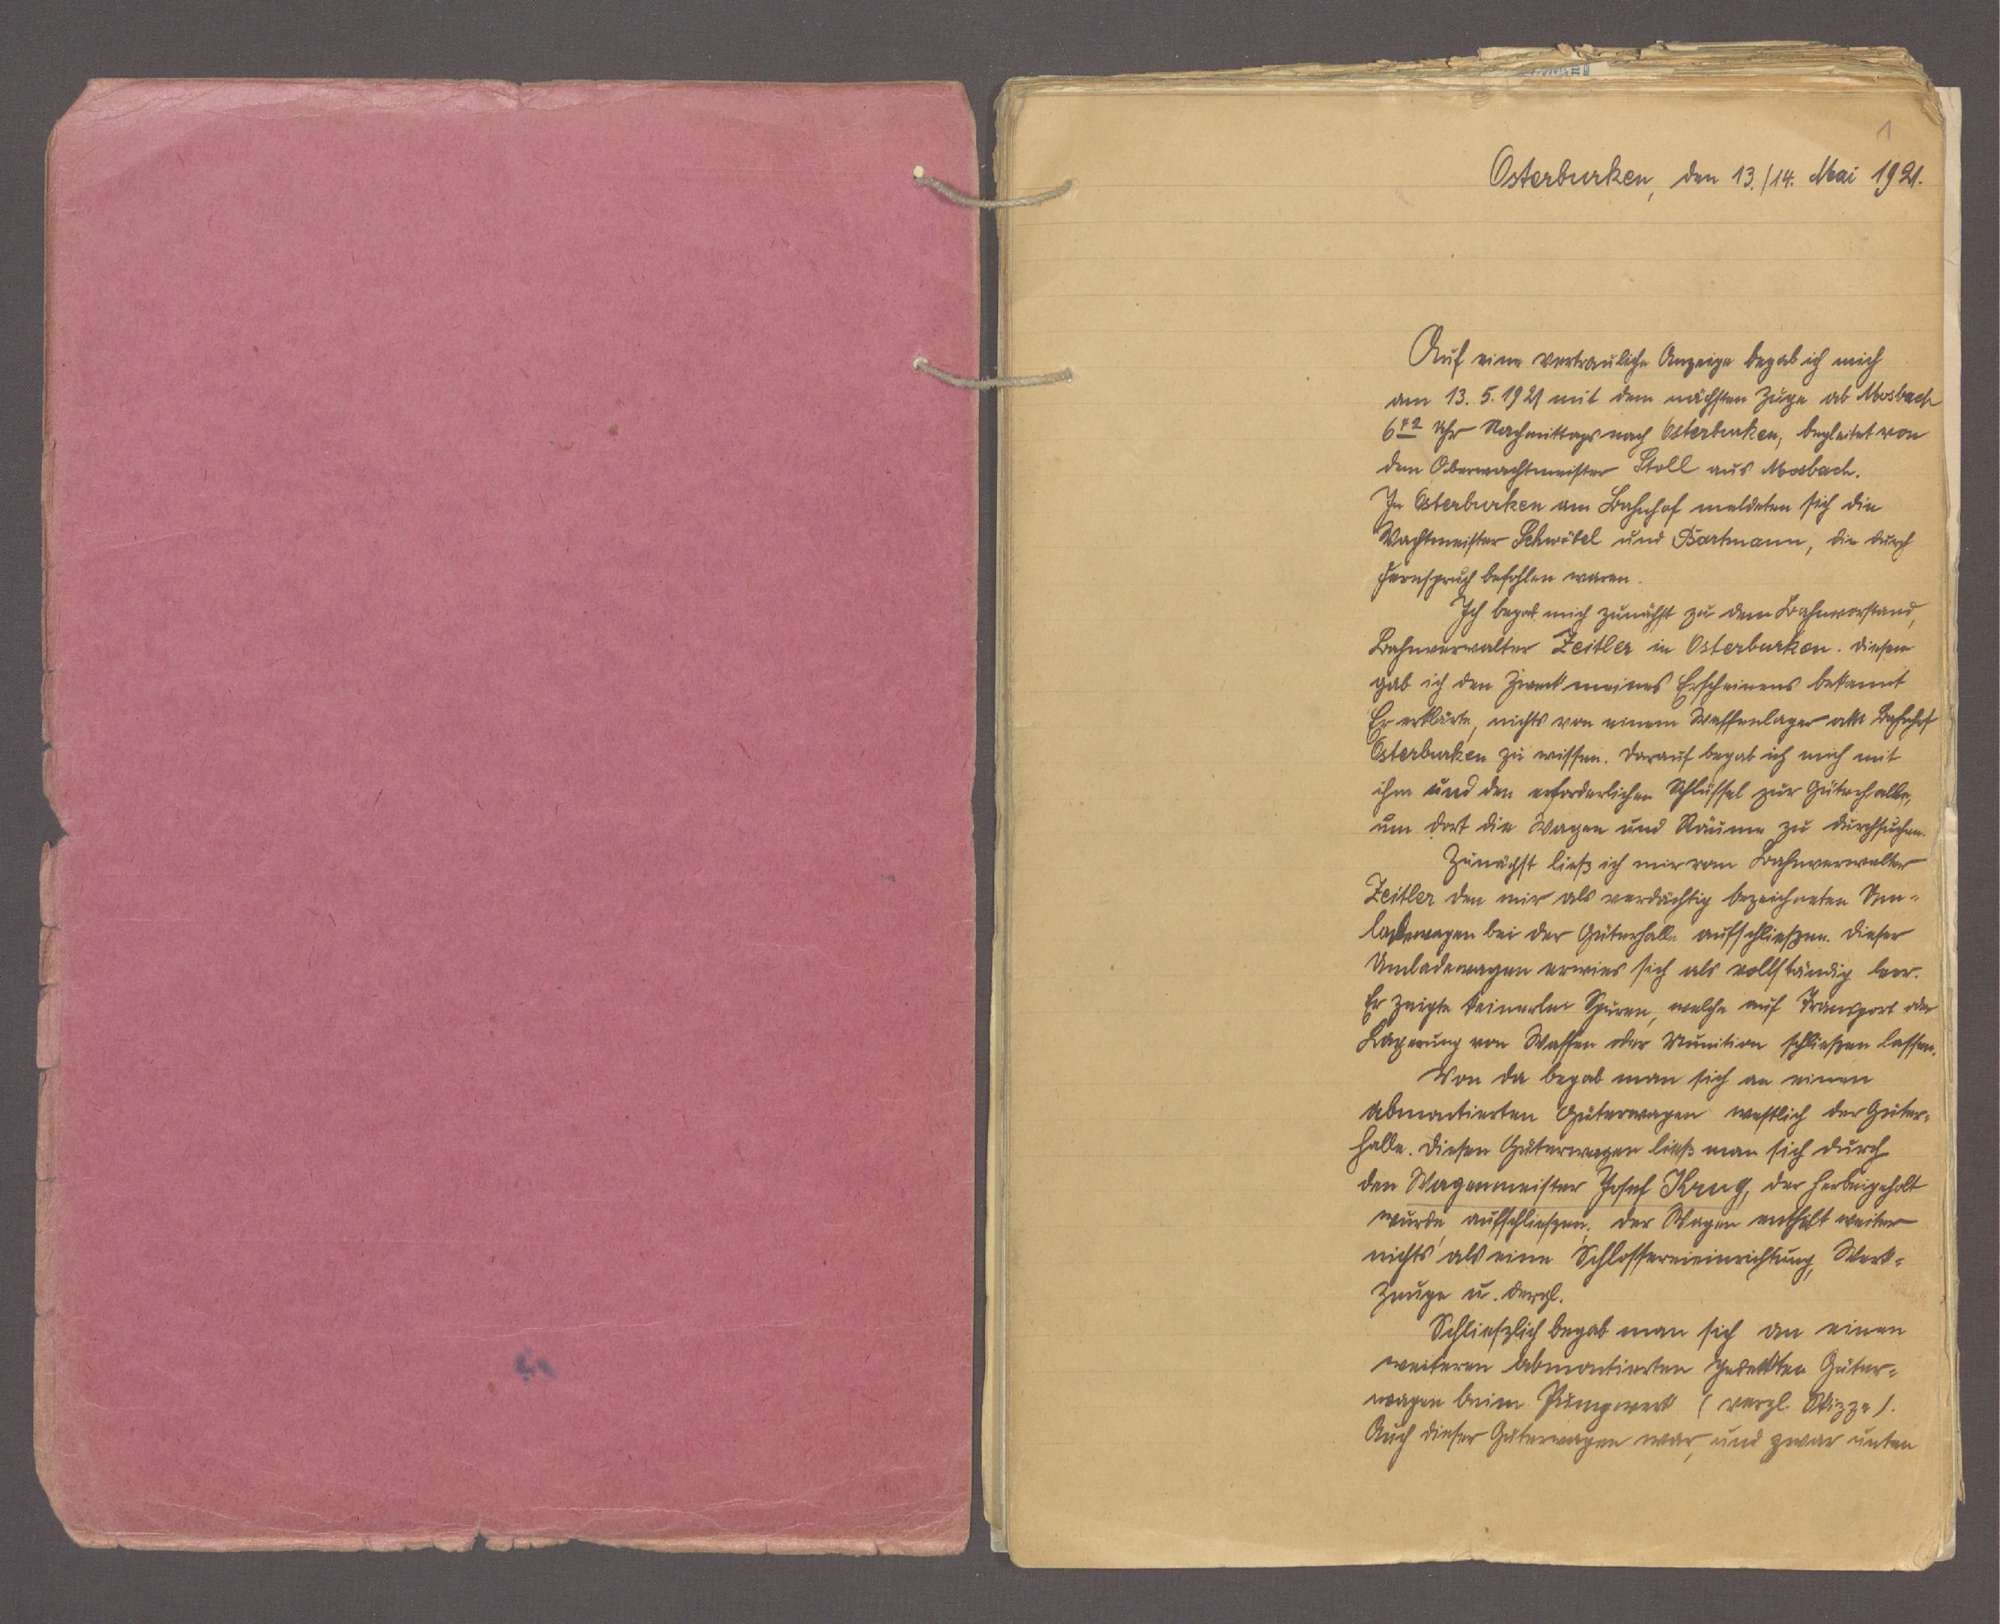 Honikel, August, geb. 09.12.1884 in Dittwar, Obereisenbahnsekretär, Bild 2